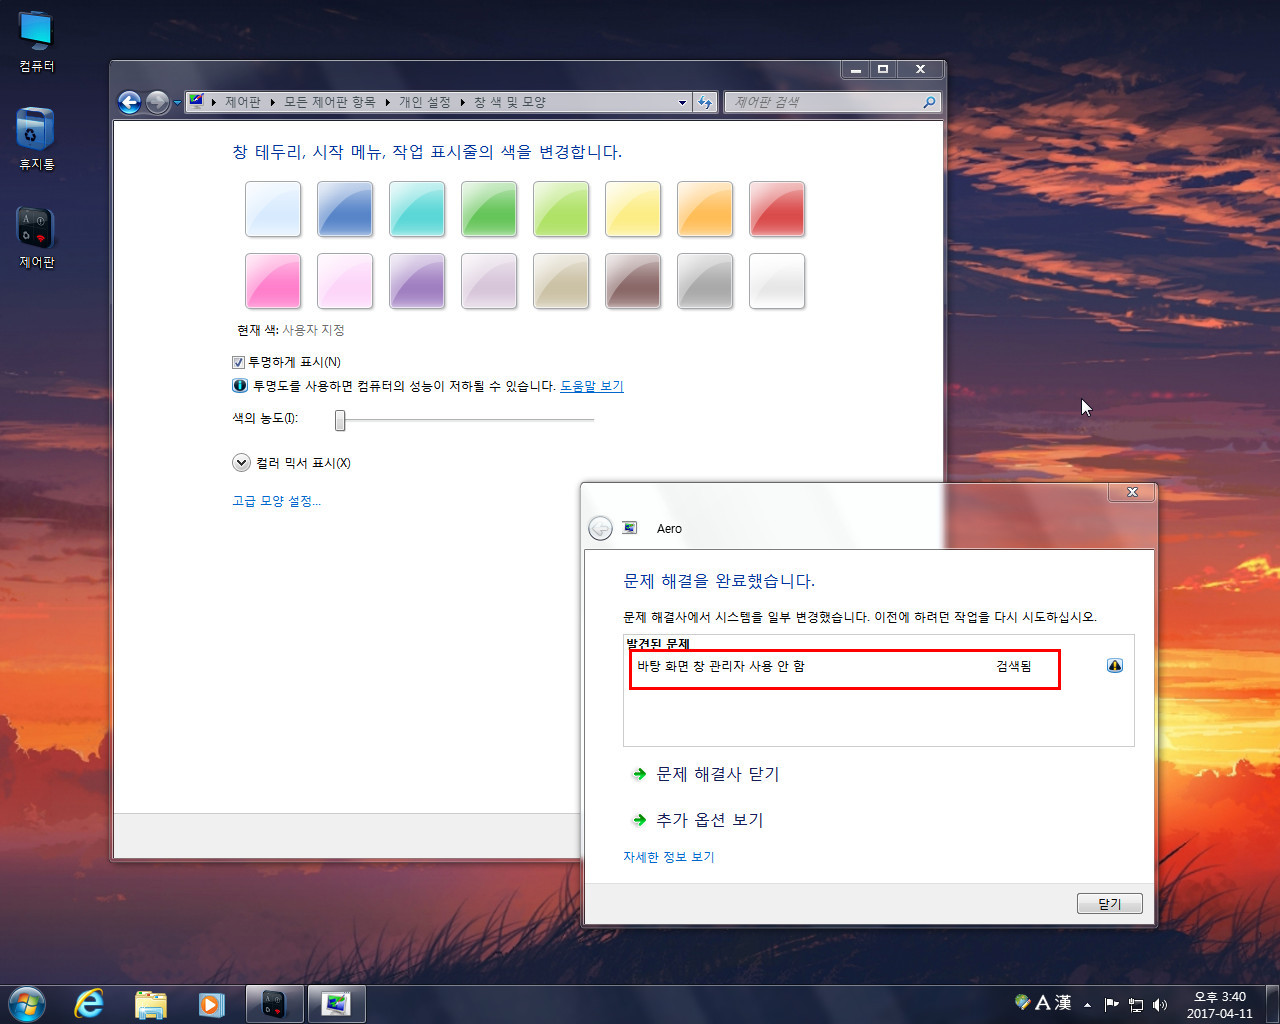 Windows 7 Ultimate_x64_Lite_KO_KY_OldMaC18.jpg